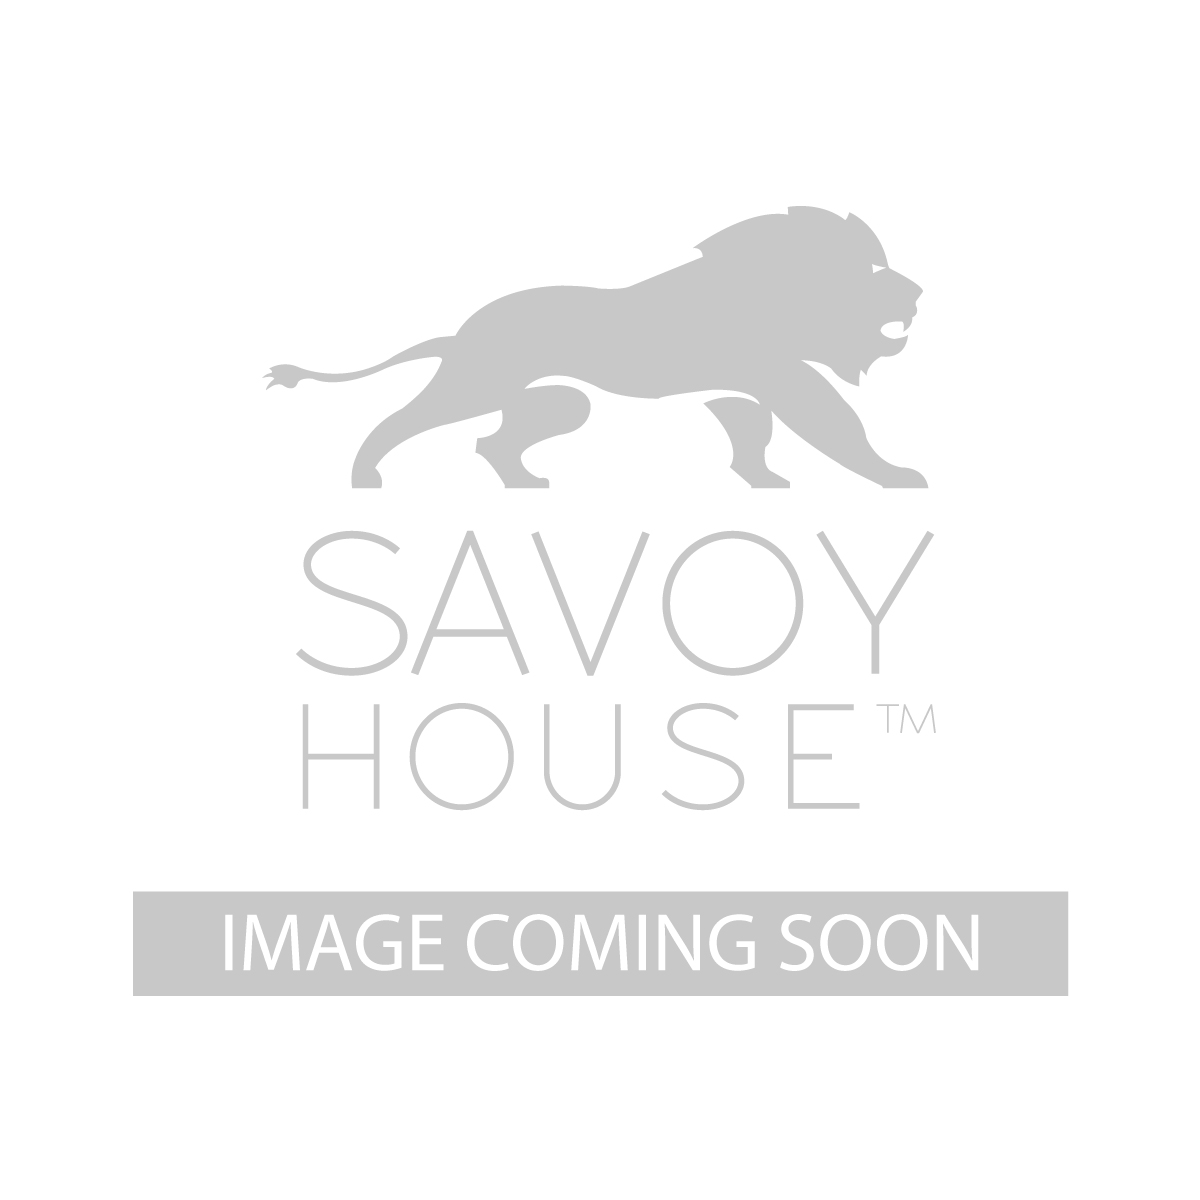 1 9403 3 11 allman 3 light chandelier by savoy house allman 3 light chandelier arubaitofo Images